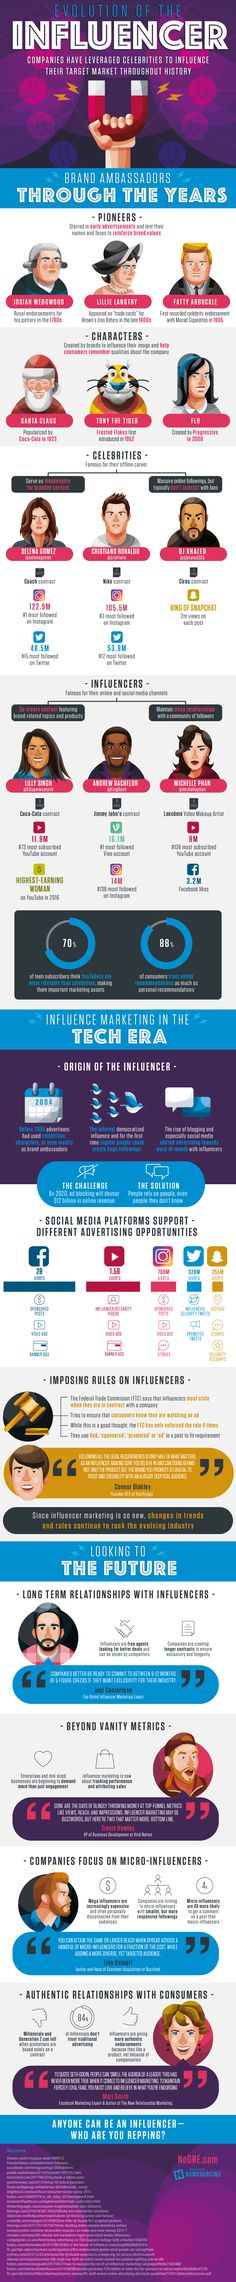 Evolution of Social Media Influencers